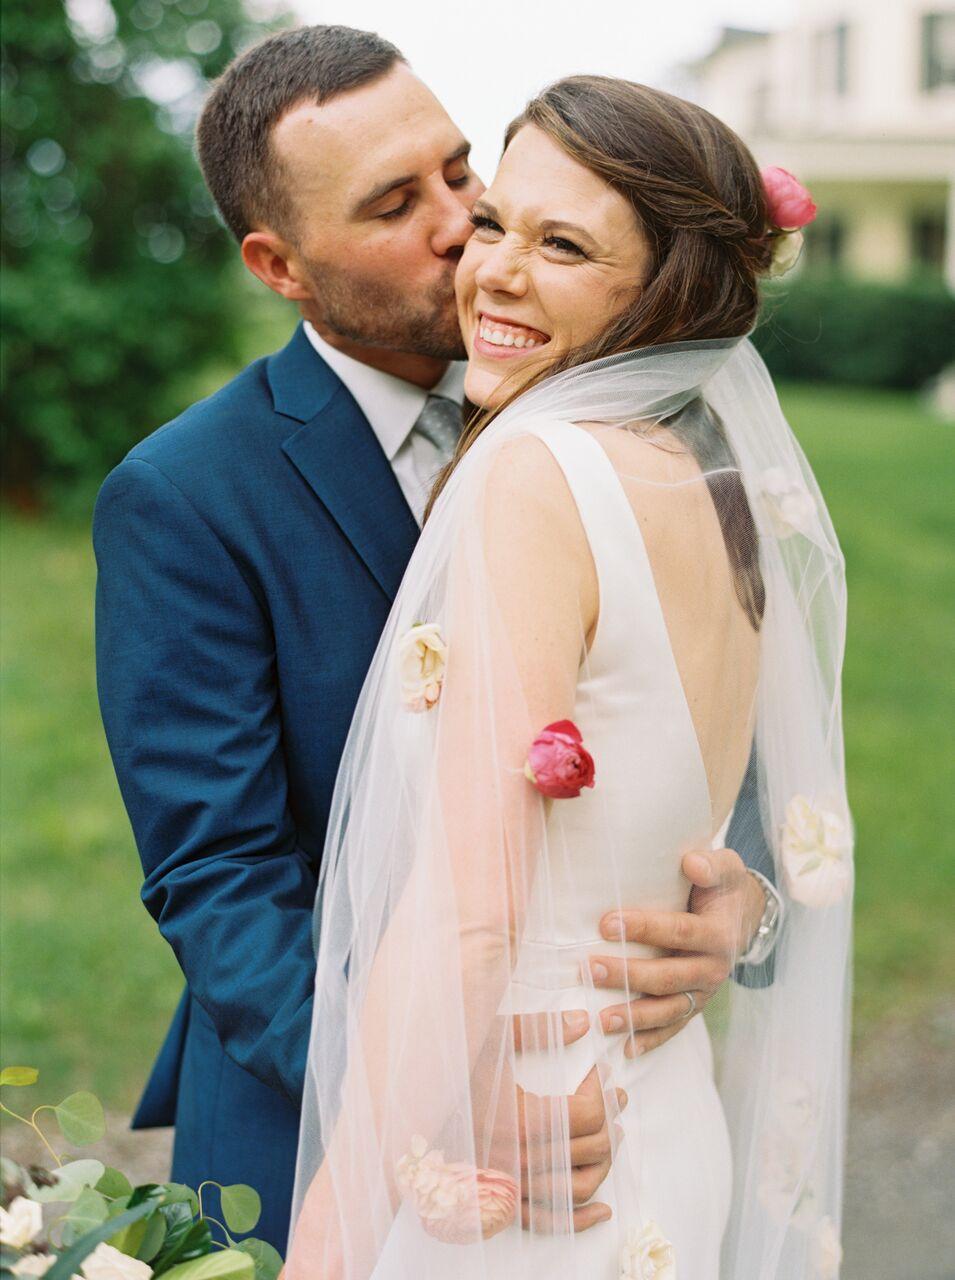 groom kissing bride flower veil